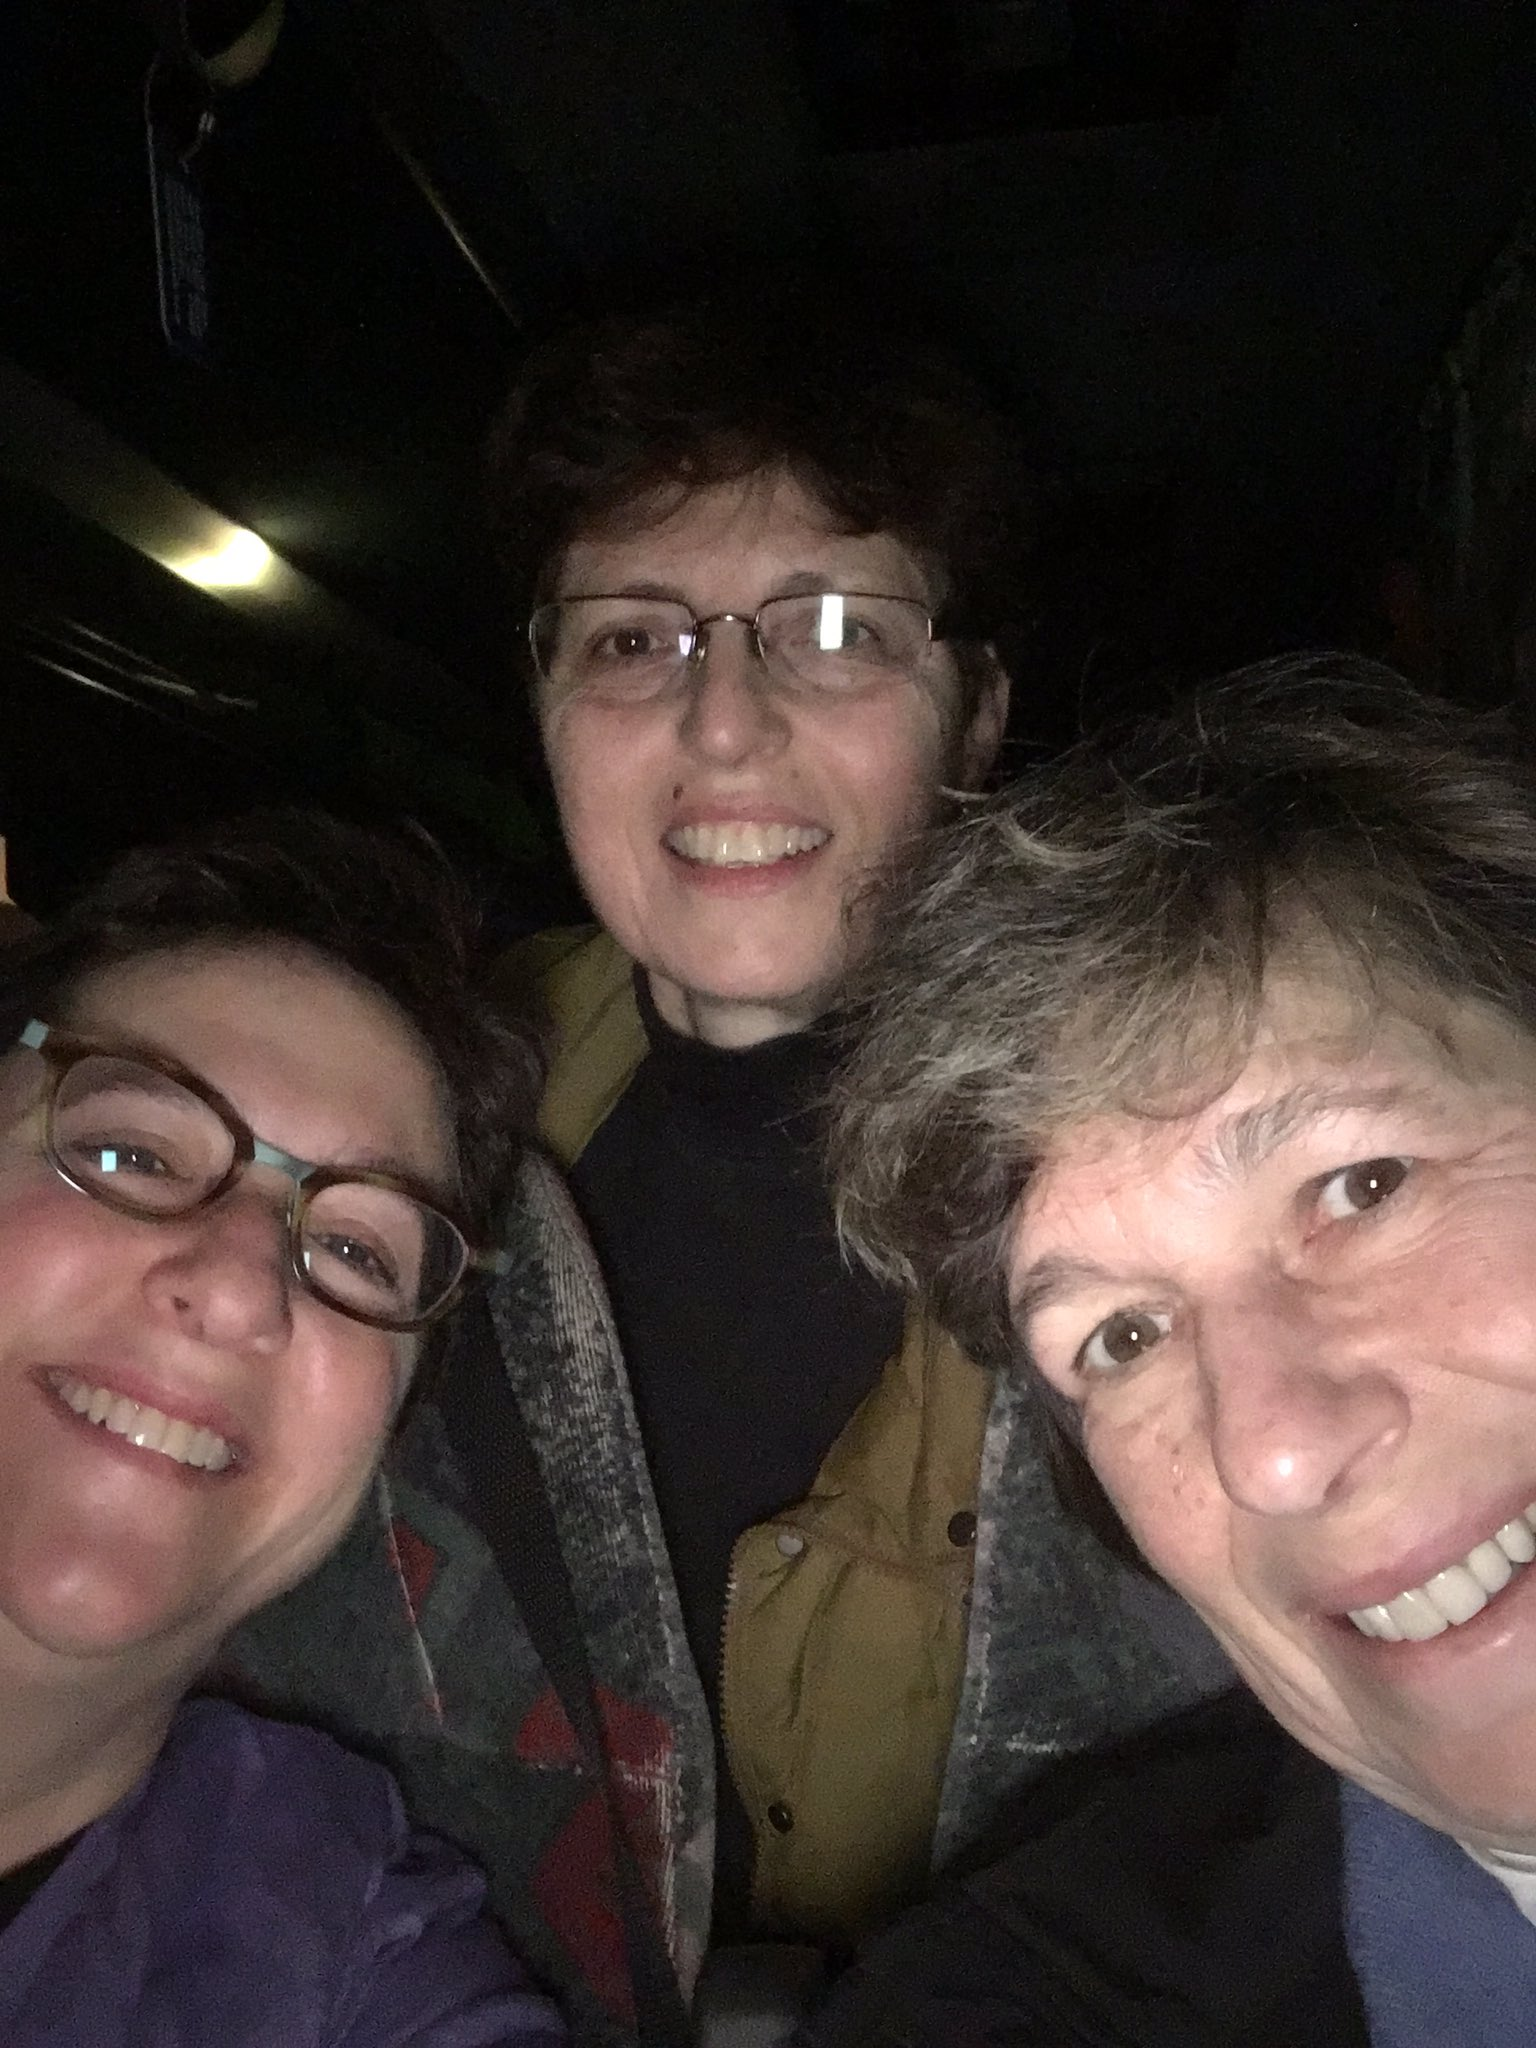 On @cbst bus be4 sun rise on the way to D.C. 4 #WomensMarch https://t.co/opSZa1EK5Q